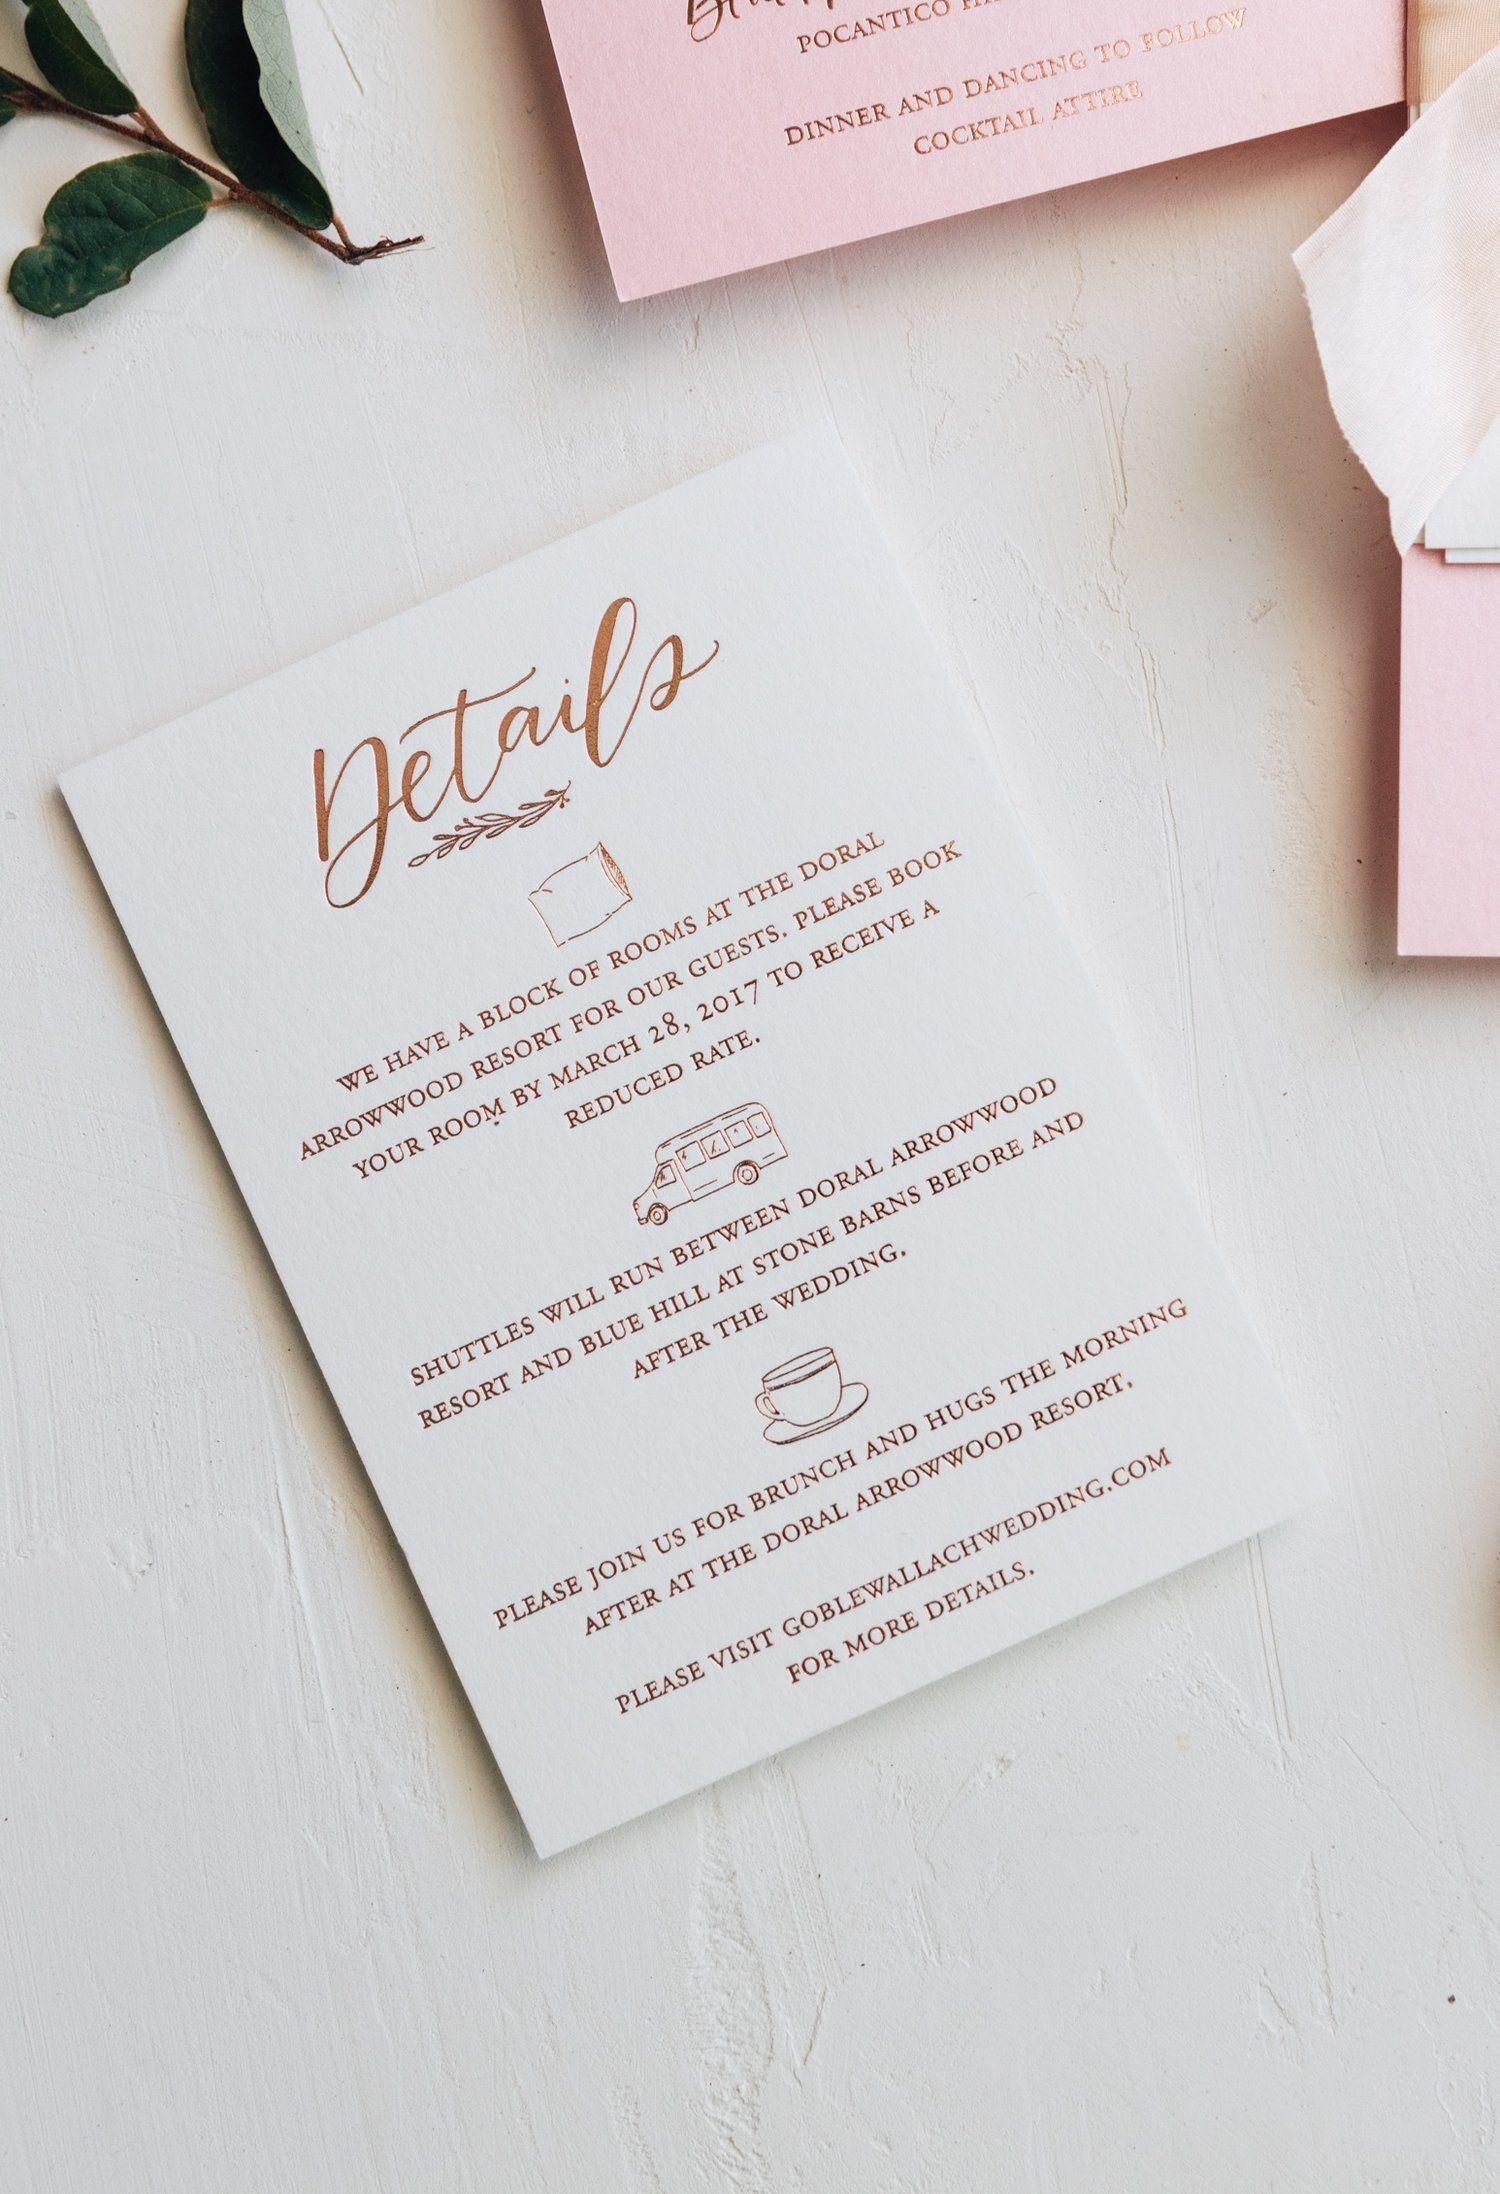 What To Put On Details Card Wedding In 2021 Wedding Invitation Details Card Bright Wedding Invitations Wedding Details Card